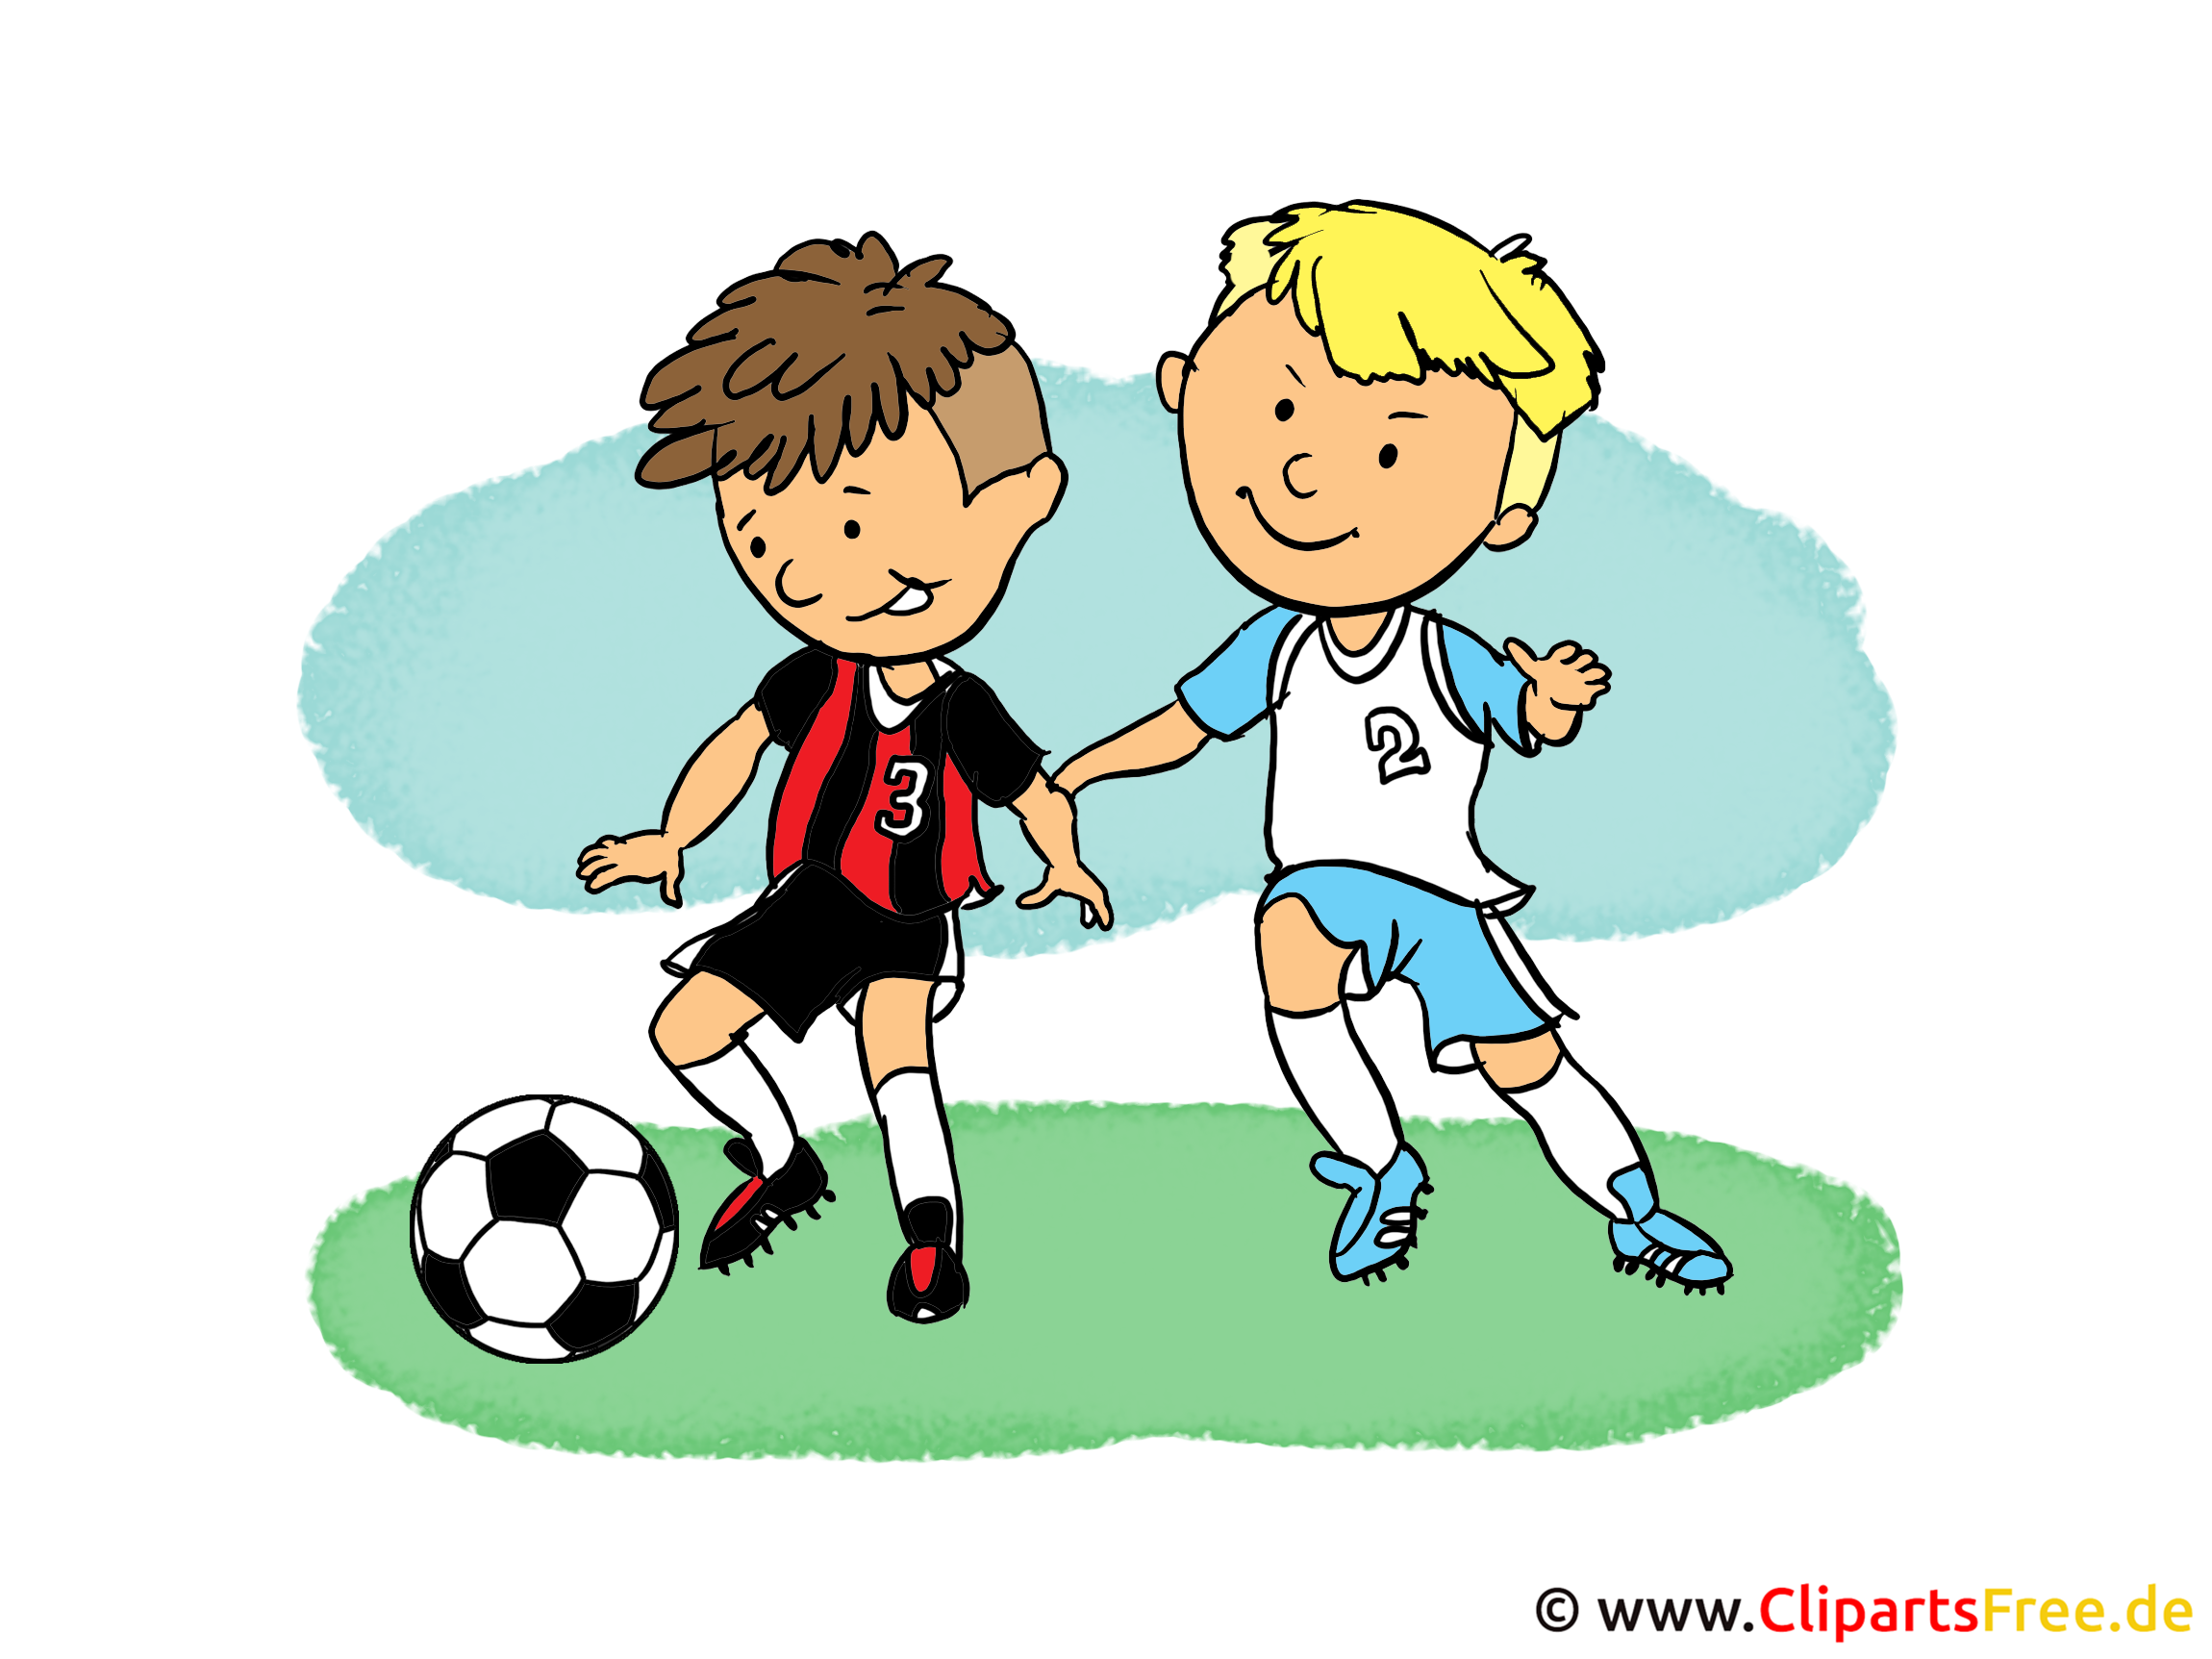 Soccer Cartoon Children playing Soccer